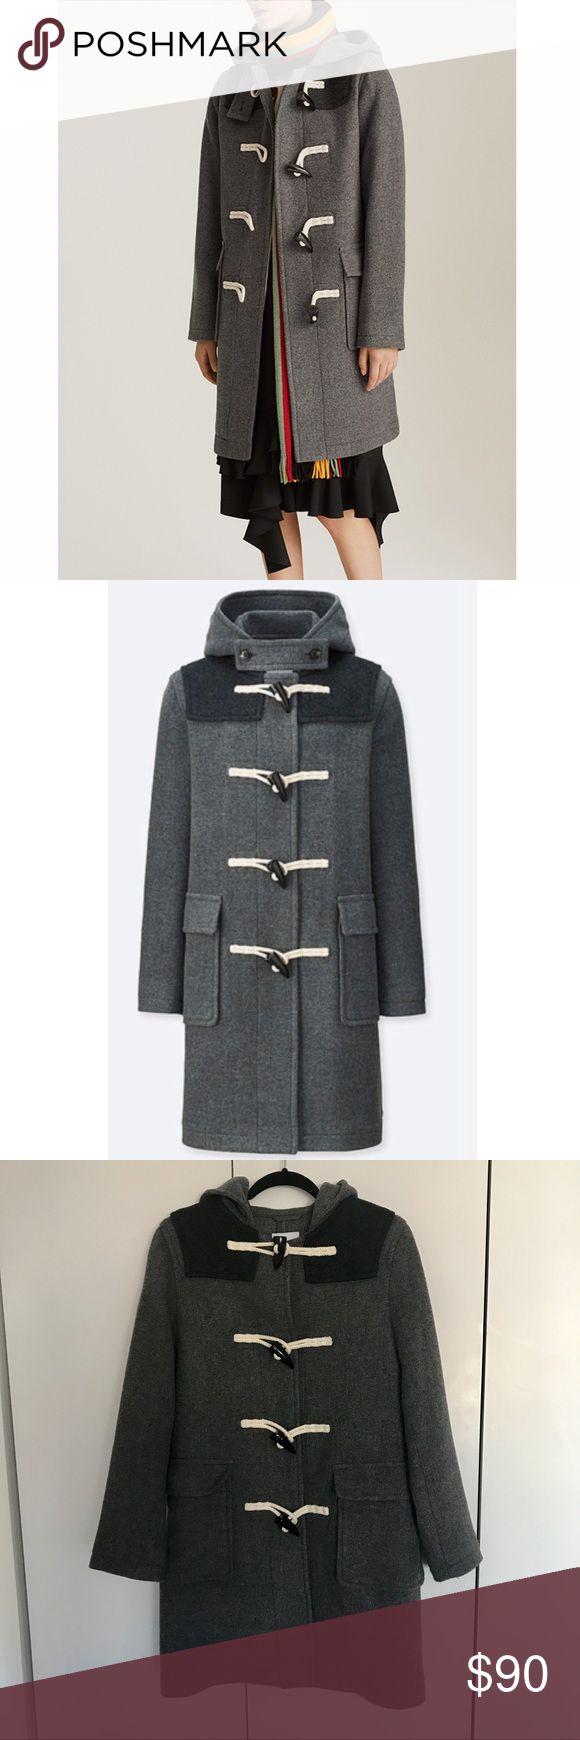 JW Anderson Uniqlo coat JW Anderson Uniqlo collection coat Perfect condition  Rarely worn Uniqlo Jackets & Coats